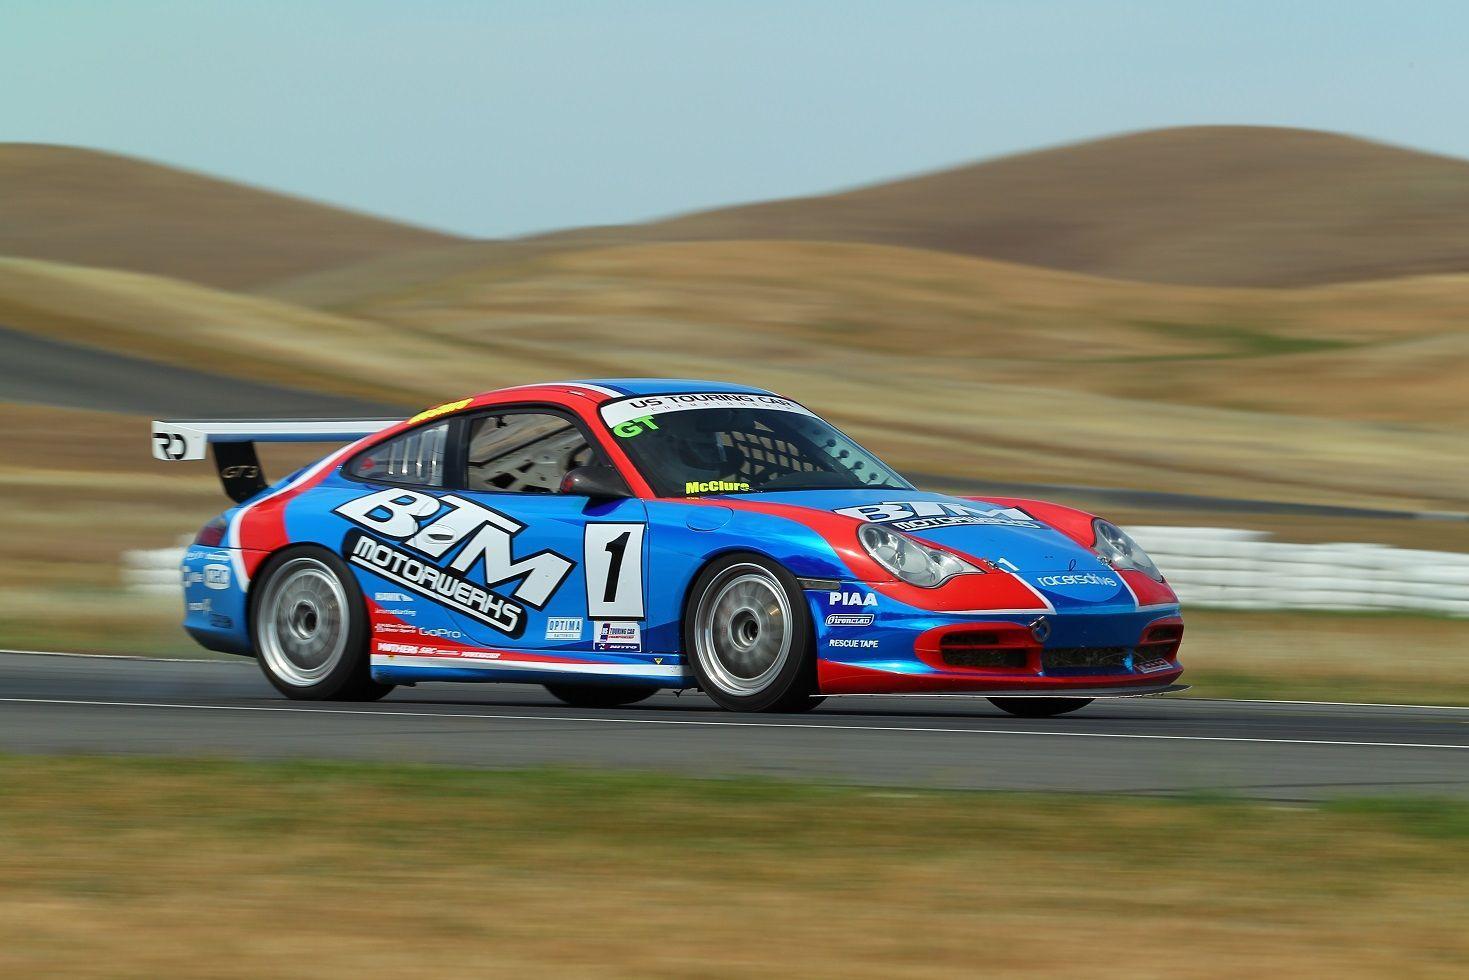 2003 Porsche 911 | 2003 Carrera